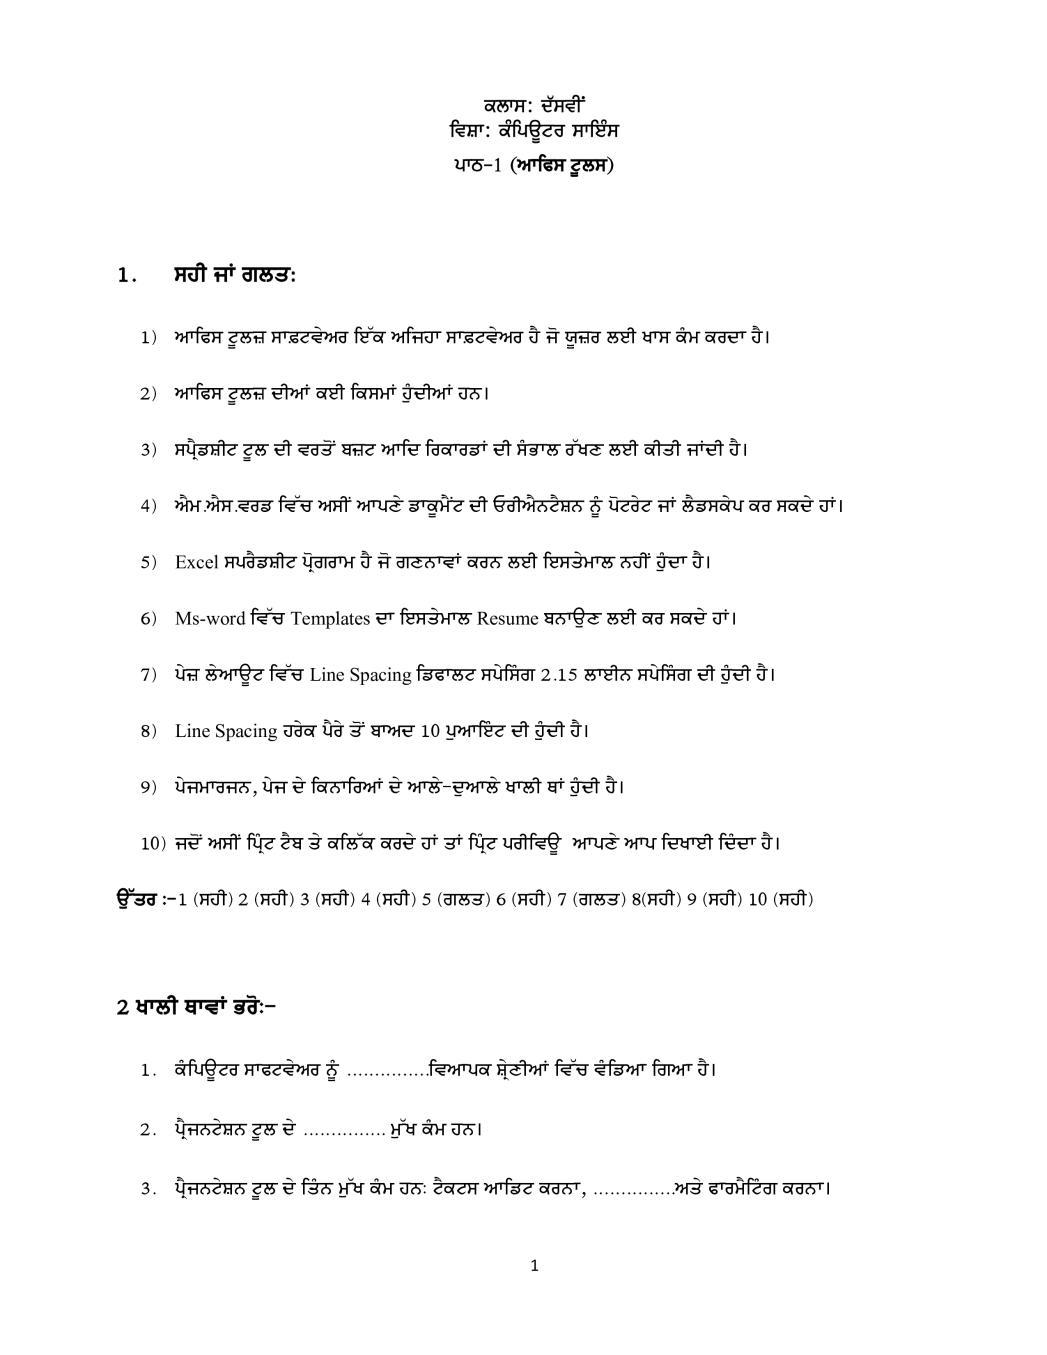 PSEB 10th Class Computer Science Question Bank (Punjabi Medium) - Page 1